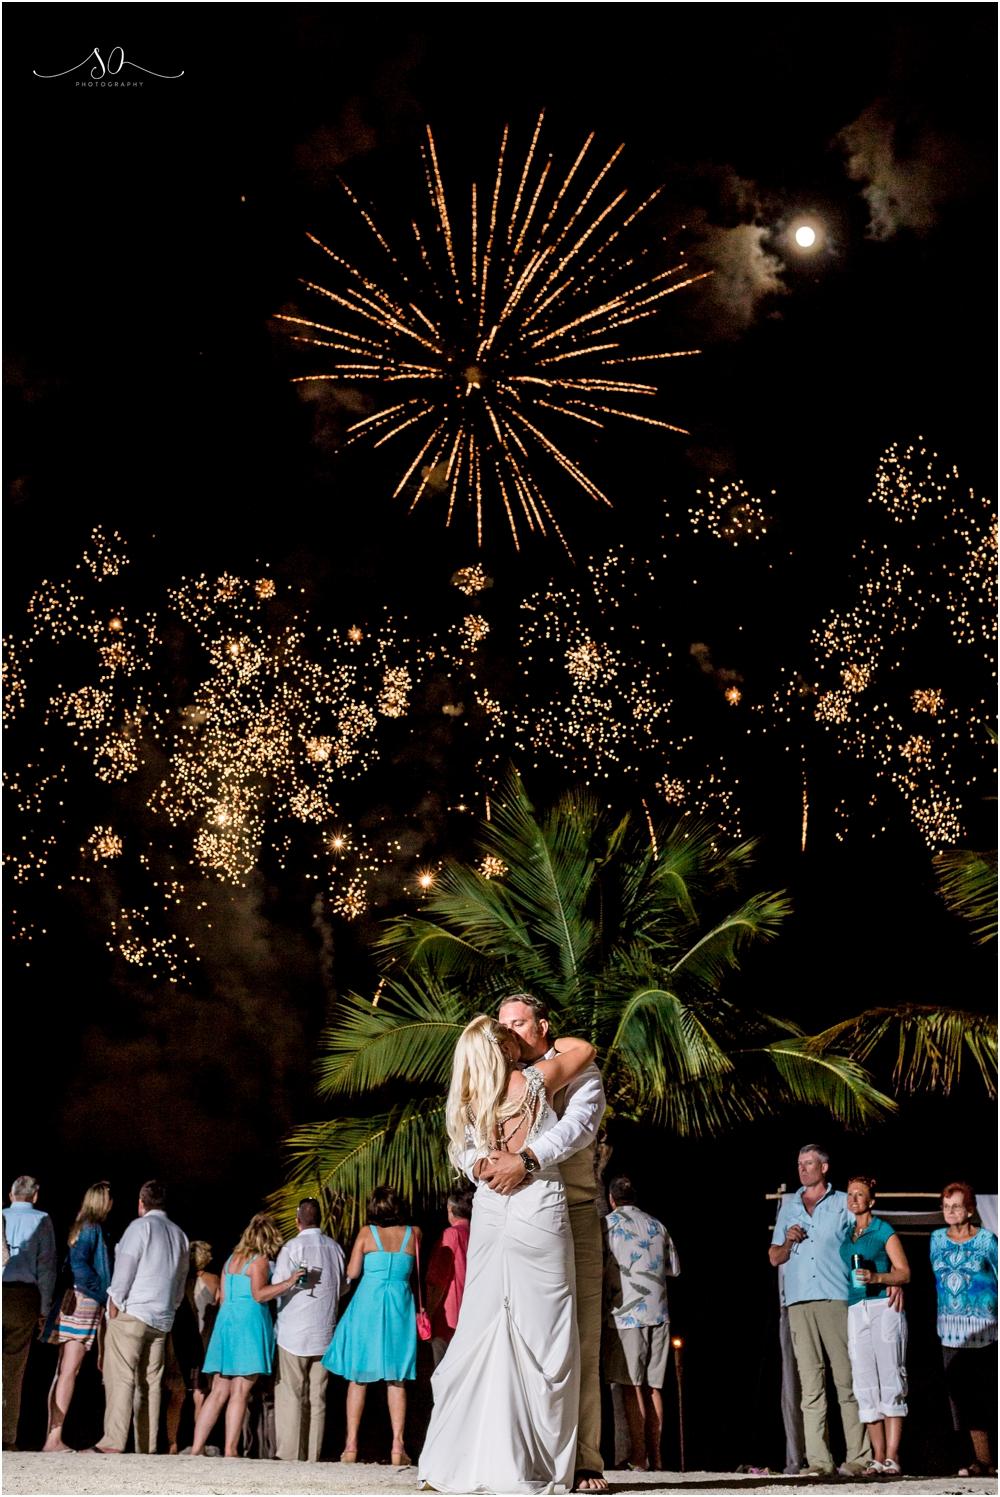 Coconut-Cove-Resort-and-Marina-Wedding-Sara-Ozim-Photography_0059.jpg